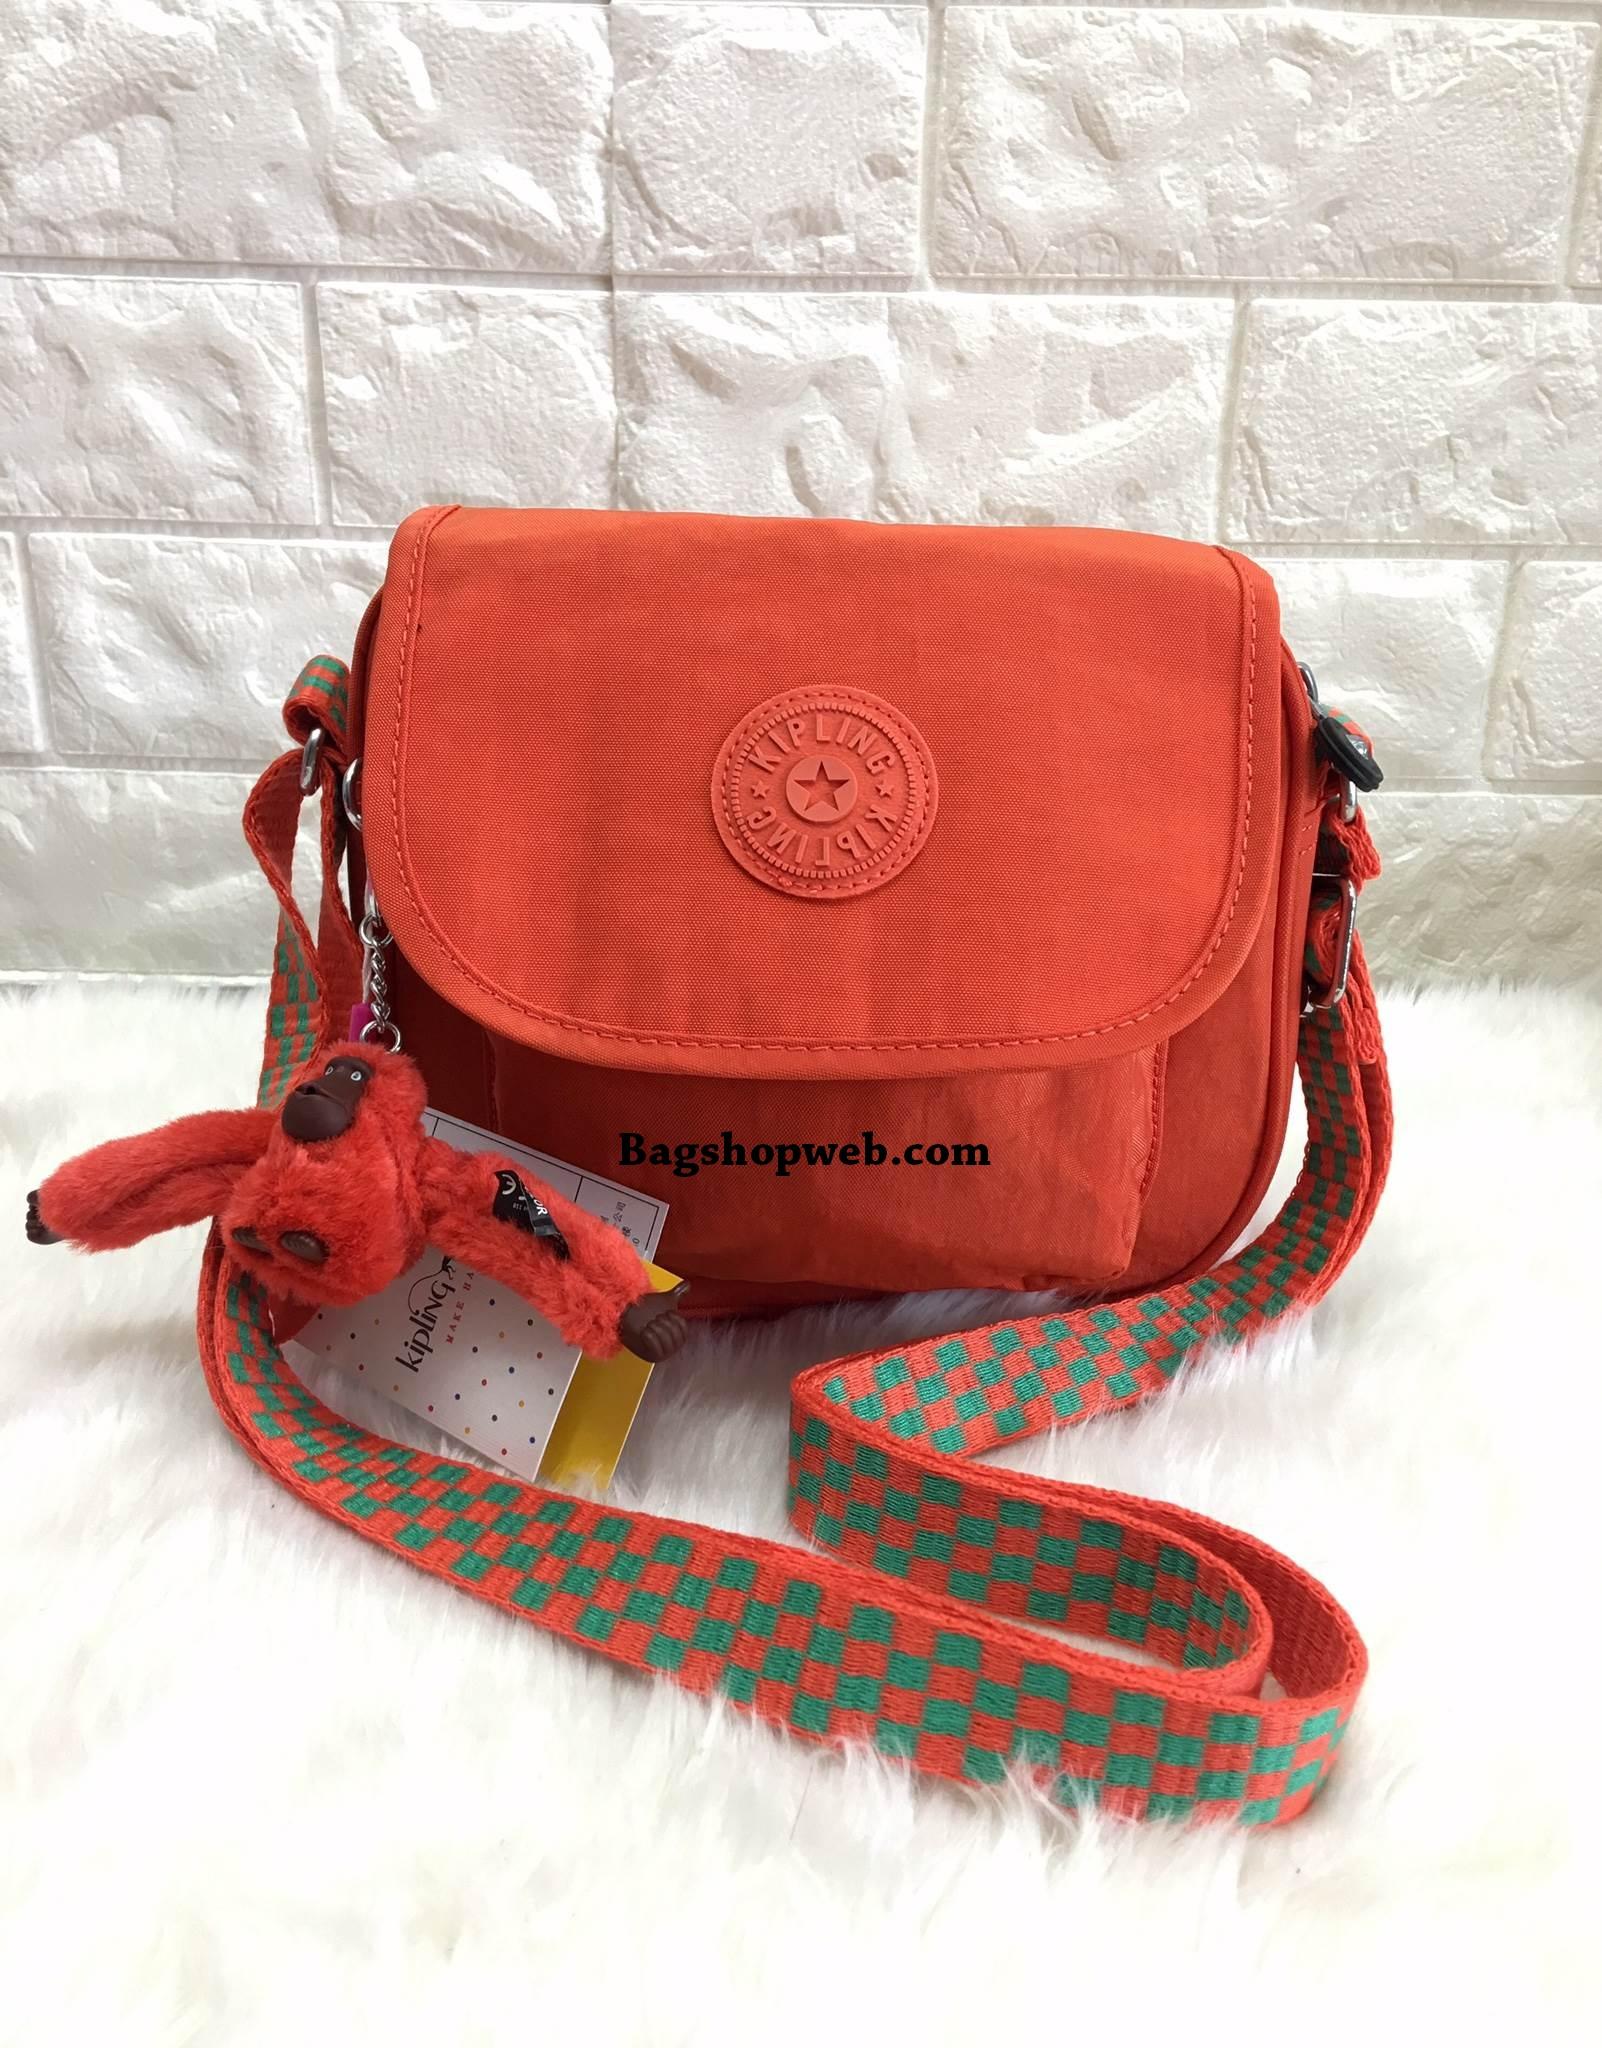 Kipling Crossbody Bag k 10026 Factory Outlet HK 2017